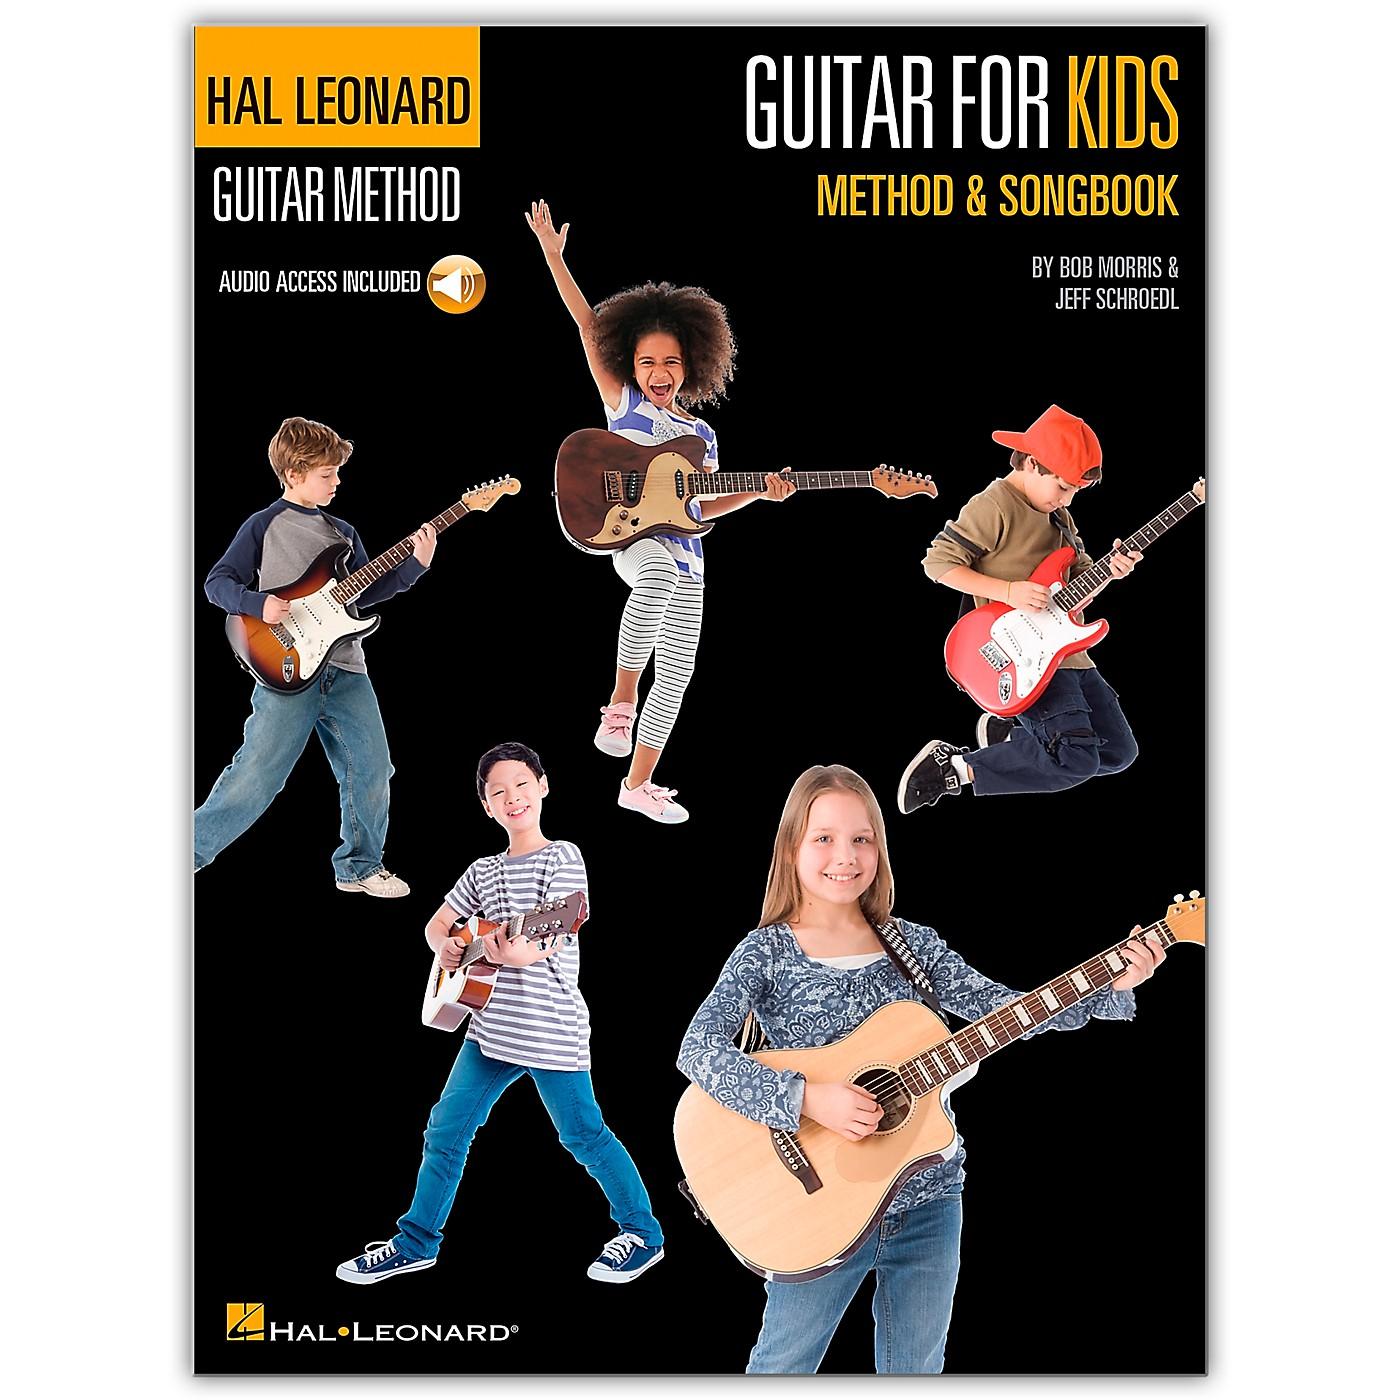 Hal Leonard Guitar for Kids Method & Songbook - Hal Leonard Guitar Method (Book/Online Audio) thumbnail